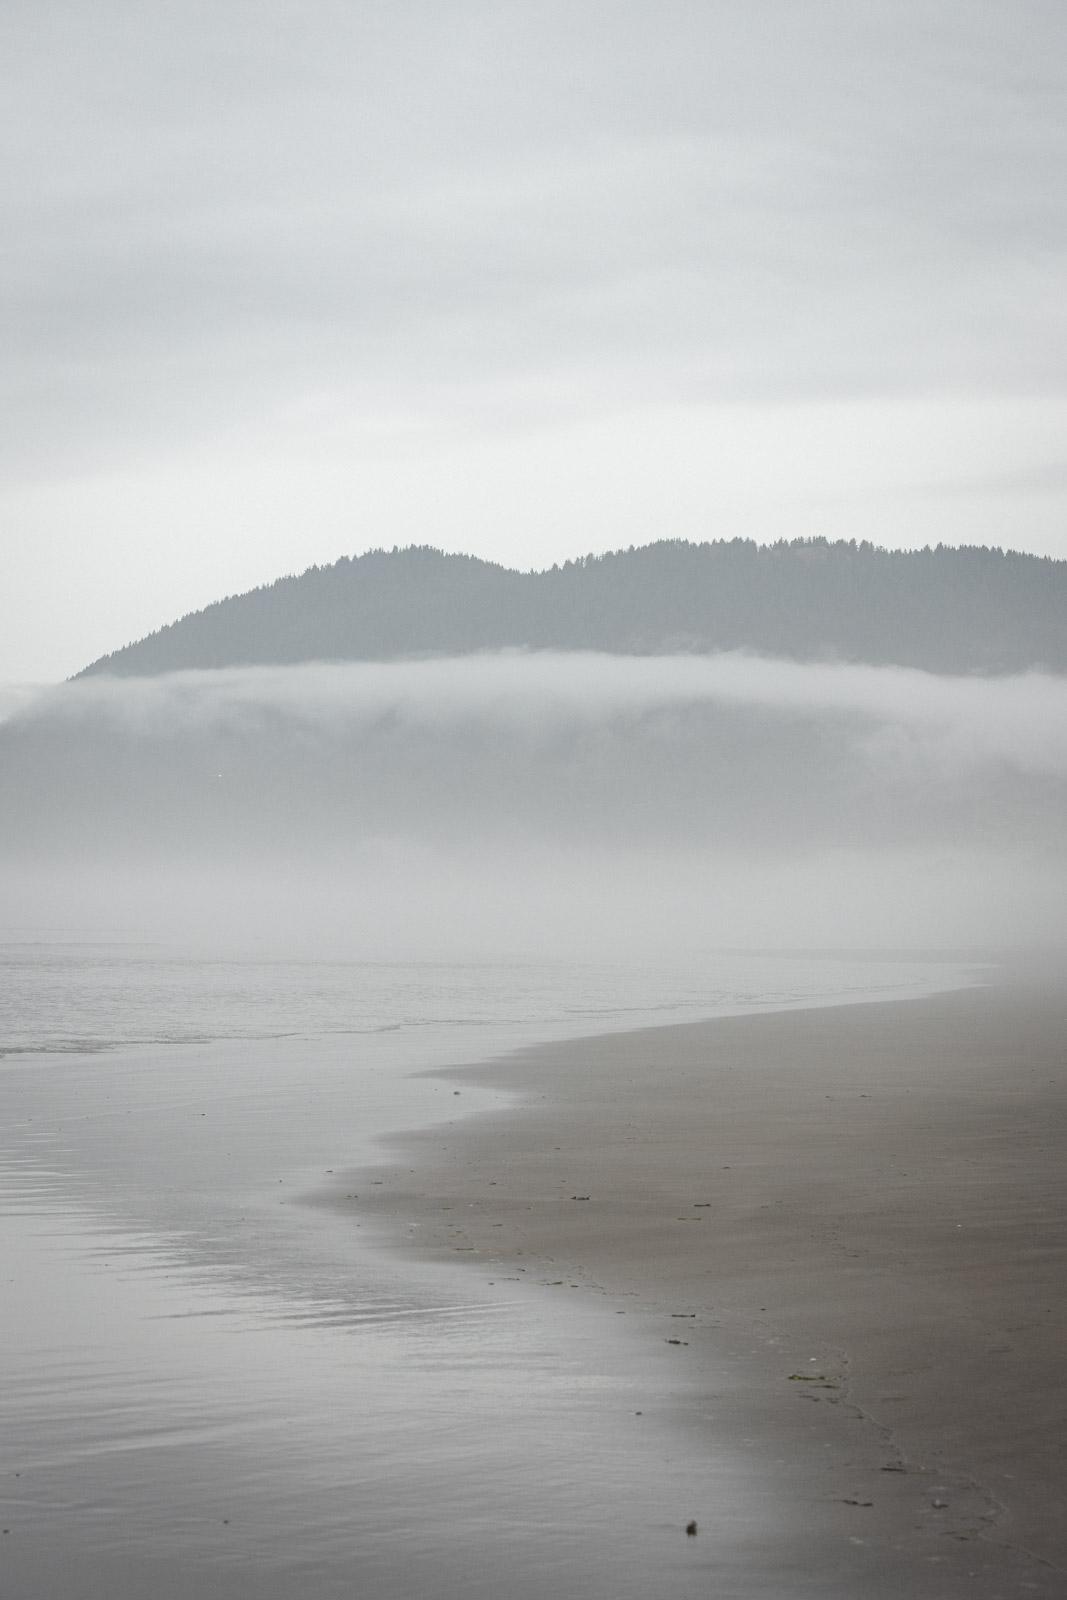 Misty beach view of Nehalem Bay, one of the Oregon Coast State Parks